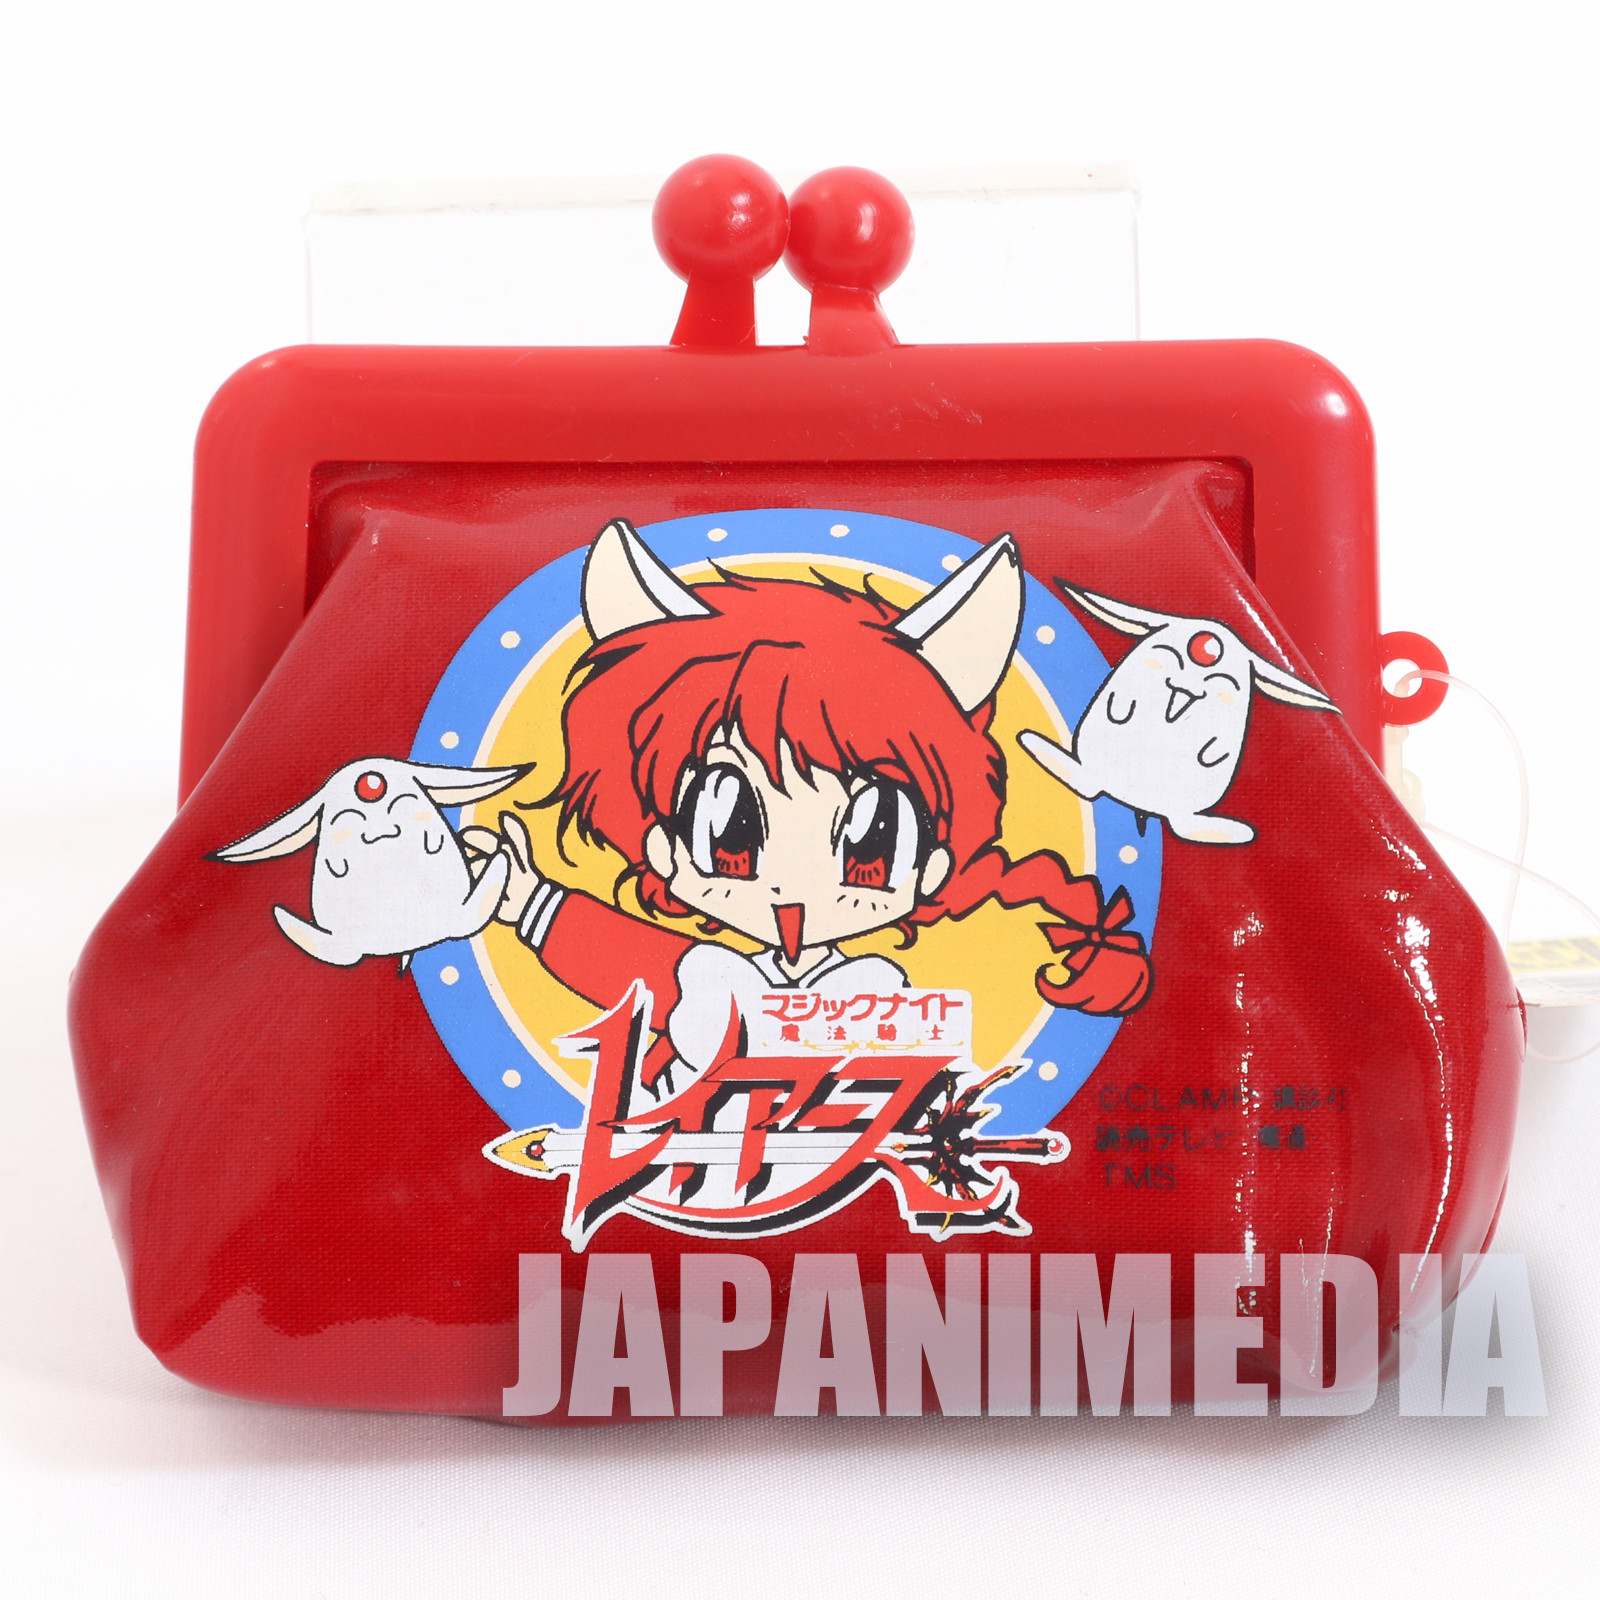 Retro Magic Knight Rayearth Hikaru Shido Purse Coin Case Red ver. JAPAN